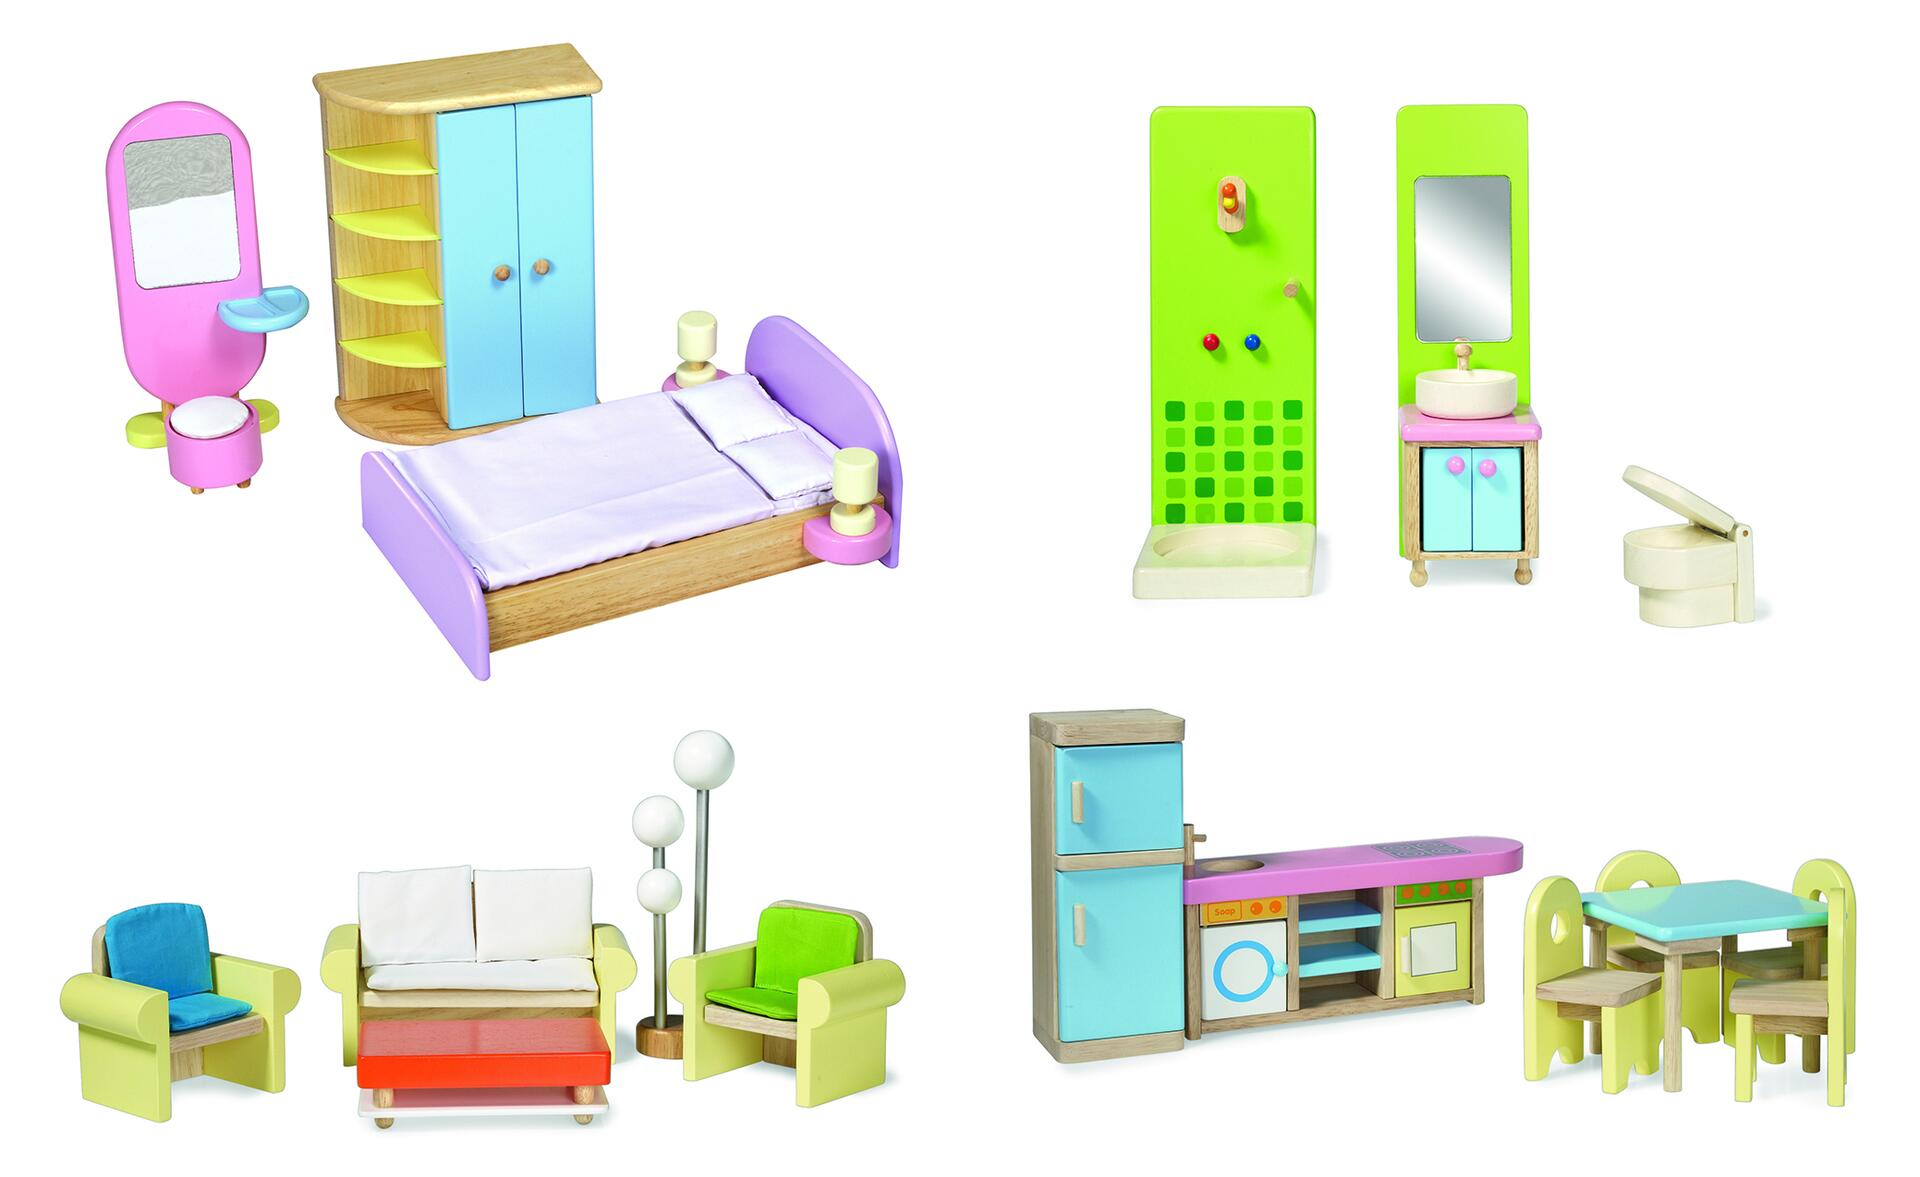 Møbelsæt stort - Lekolar Danmark